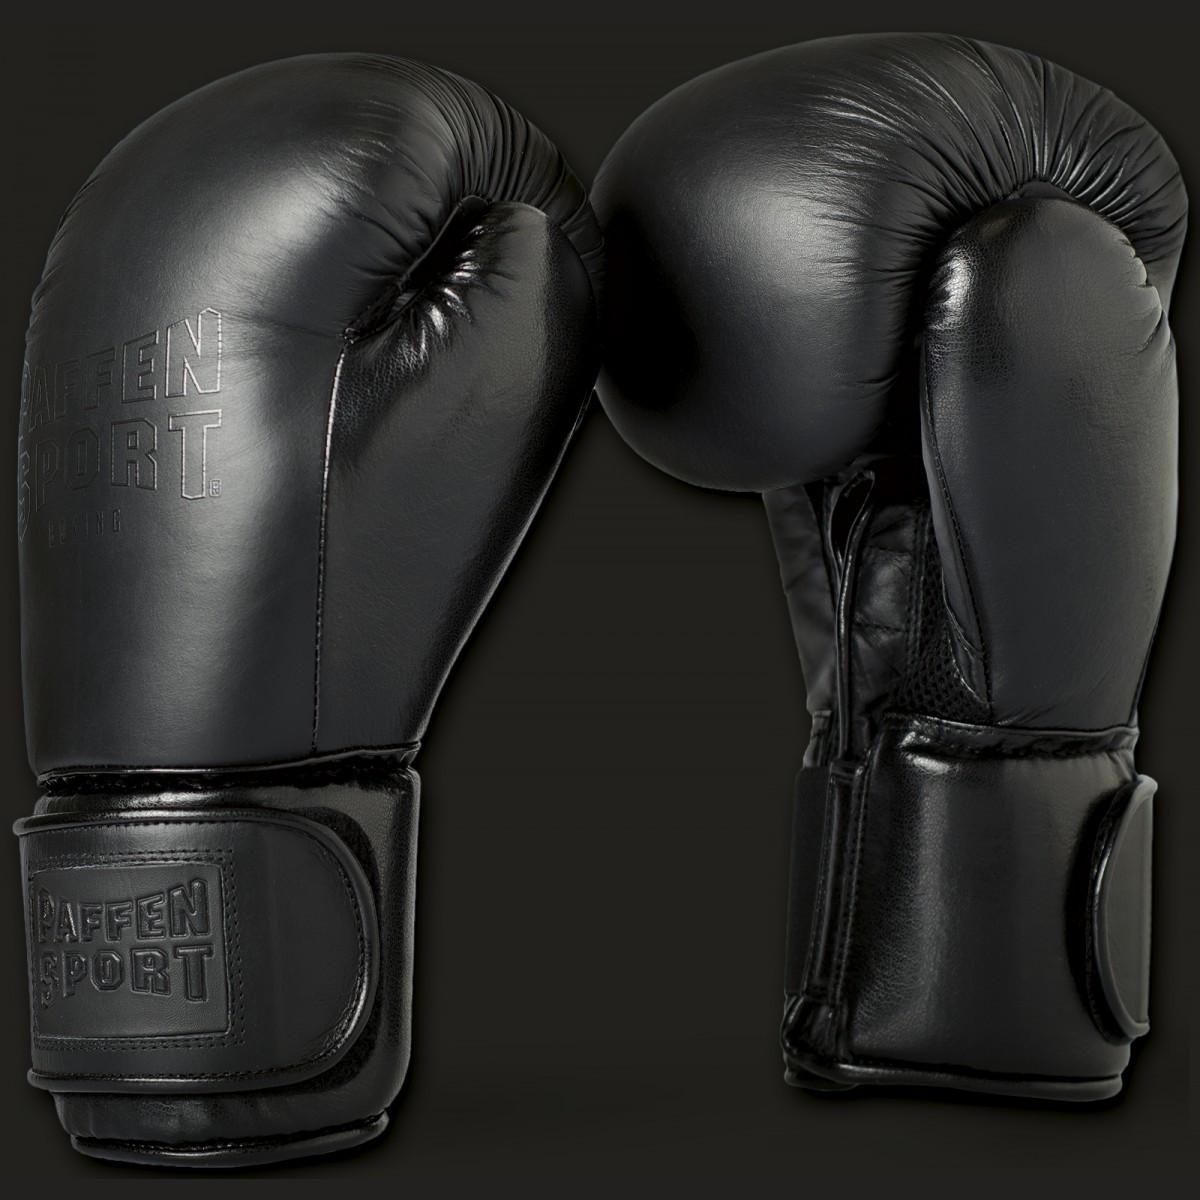 Перчатки Paffen Sport BLACK LOGO